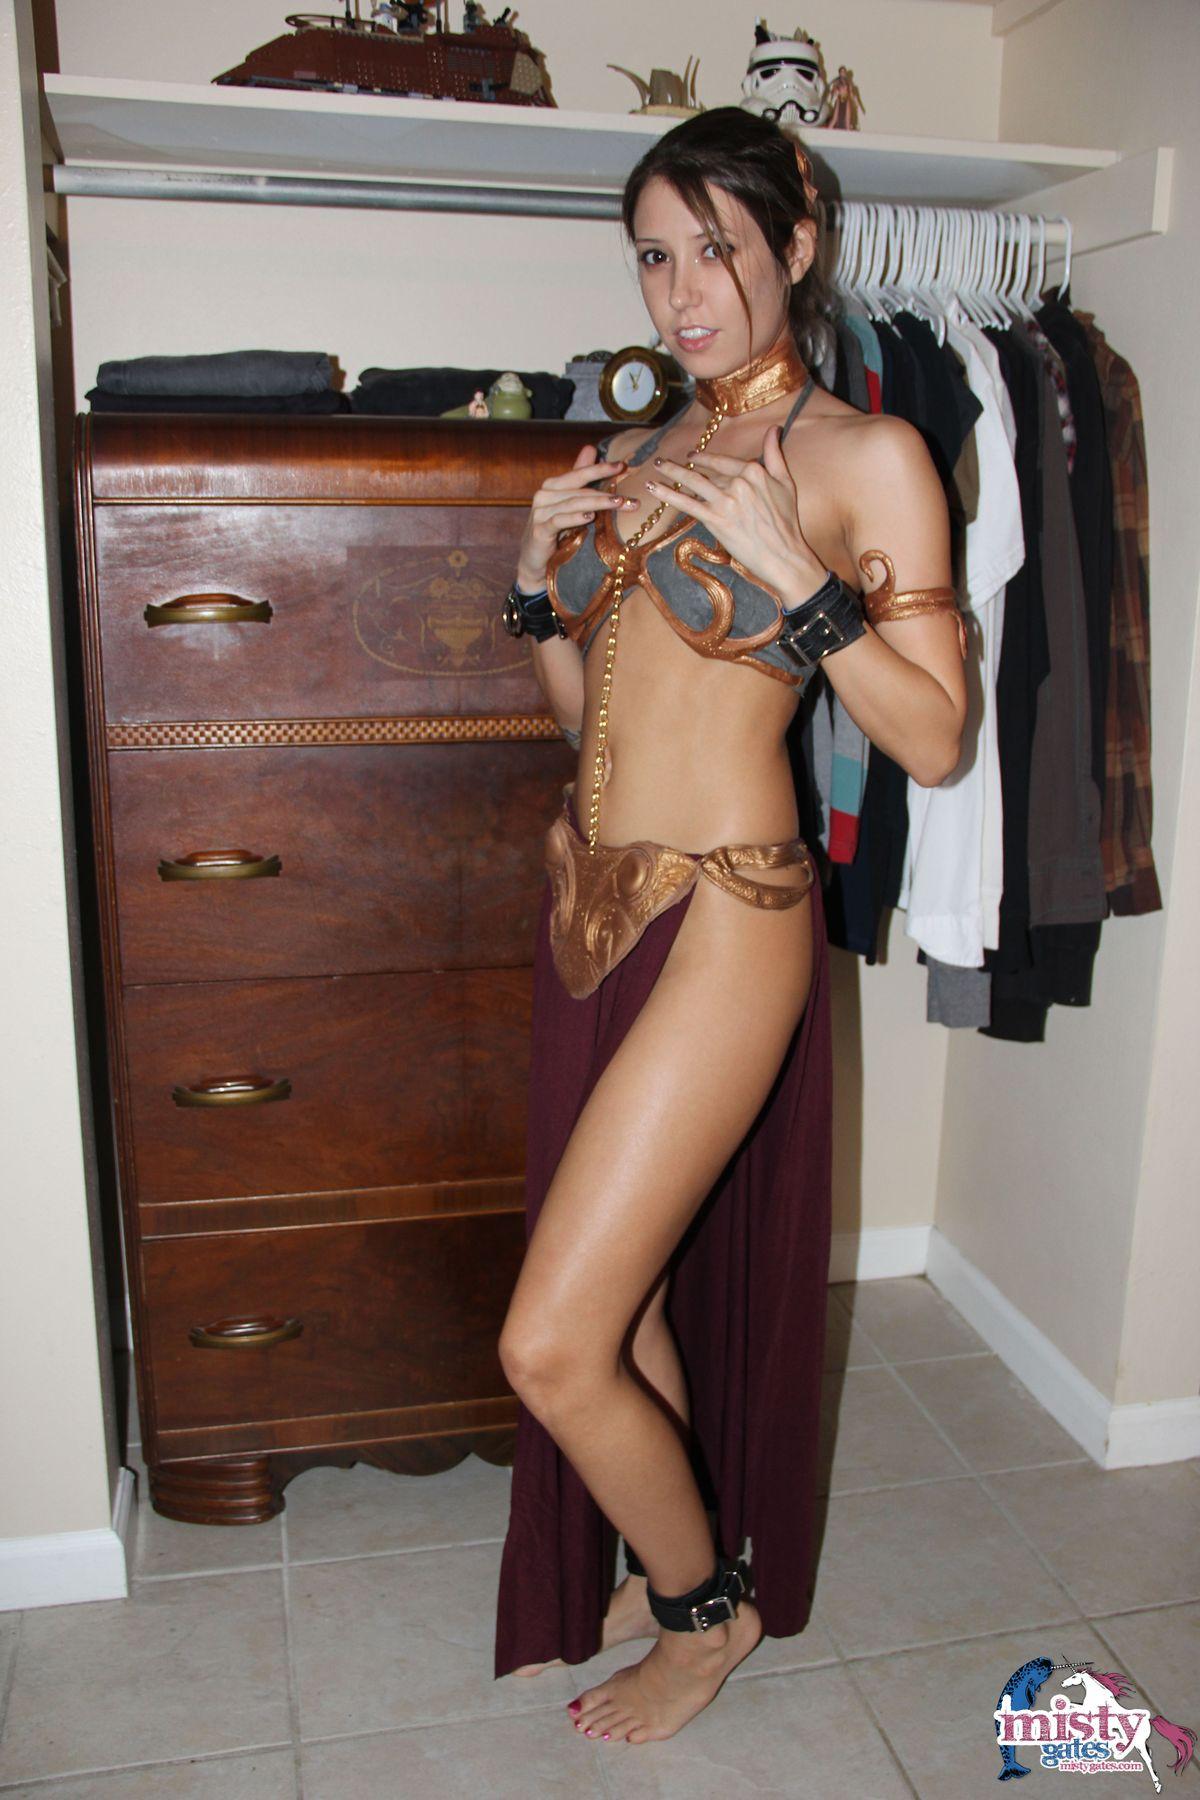 Misty Gates Princesa Leia Cosplay · Princesa Leia Cosplay · Misty Gates · Princesa Leia en Xxx · Misty Gates Maravillosa Fetichismo de pies Muñeca Playa nudista.